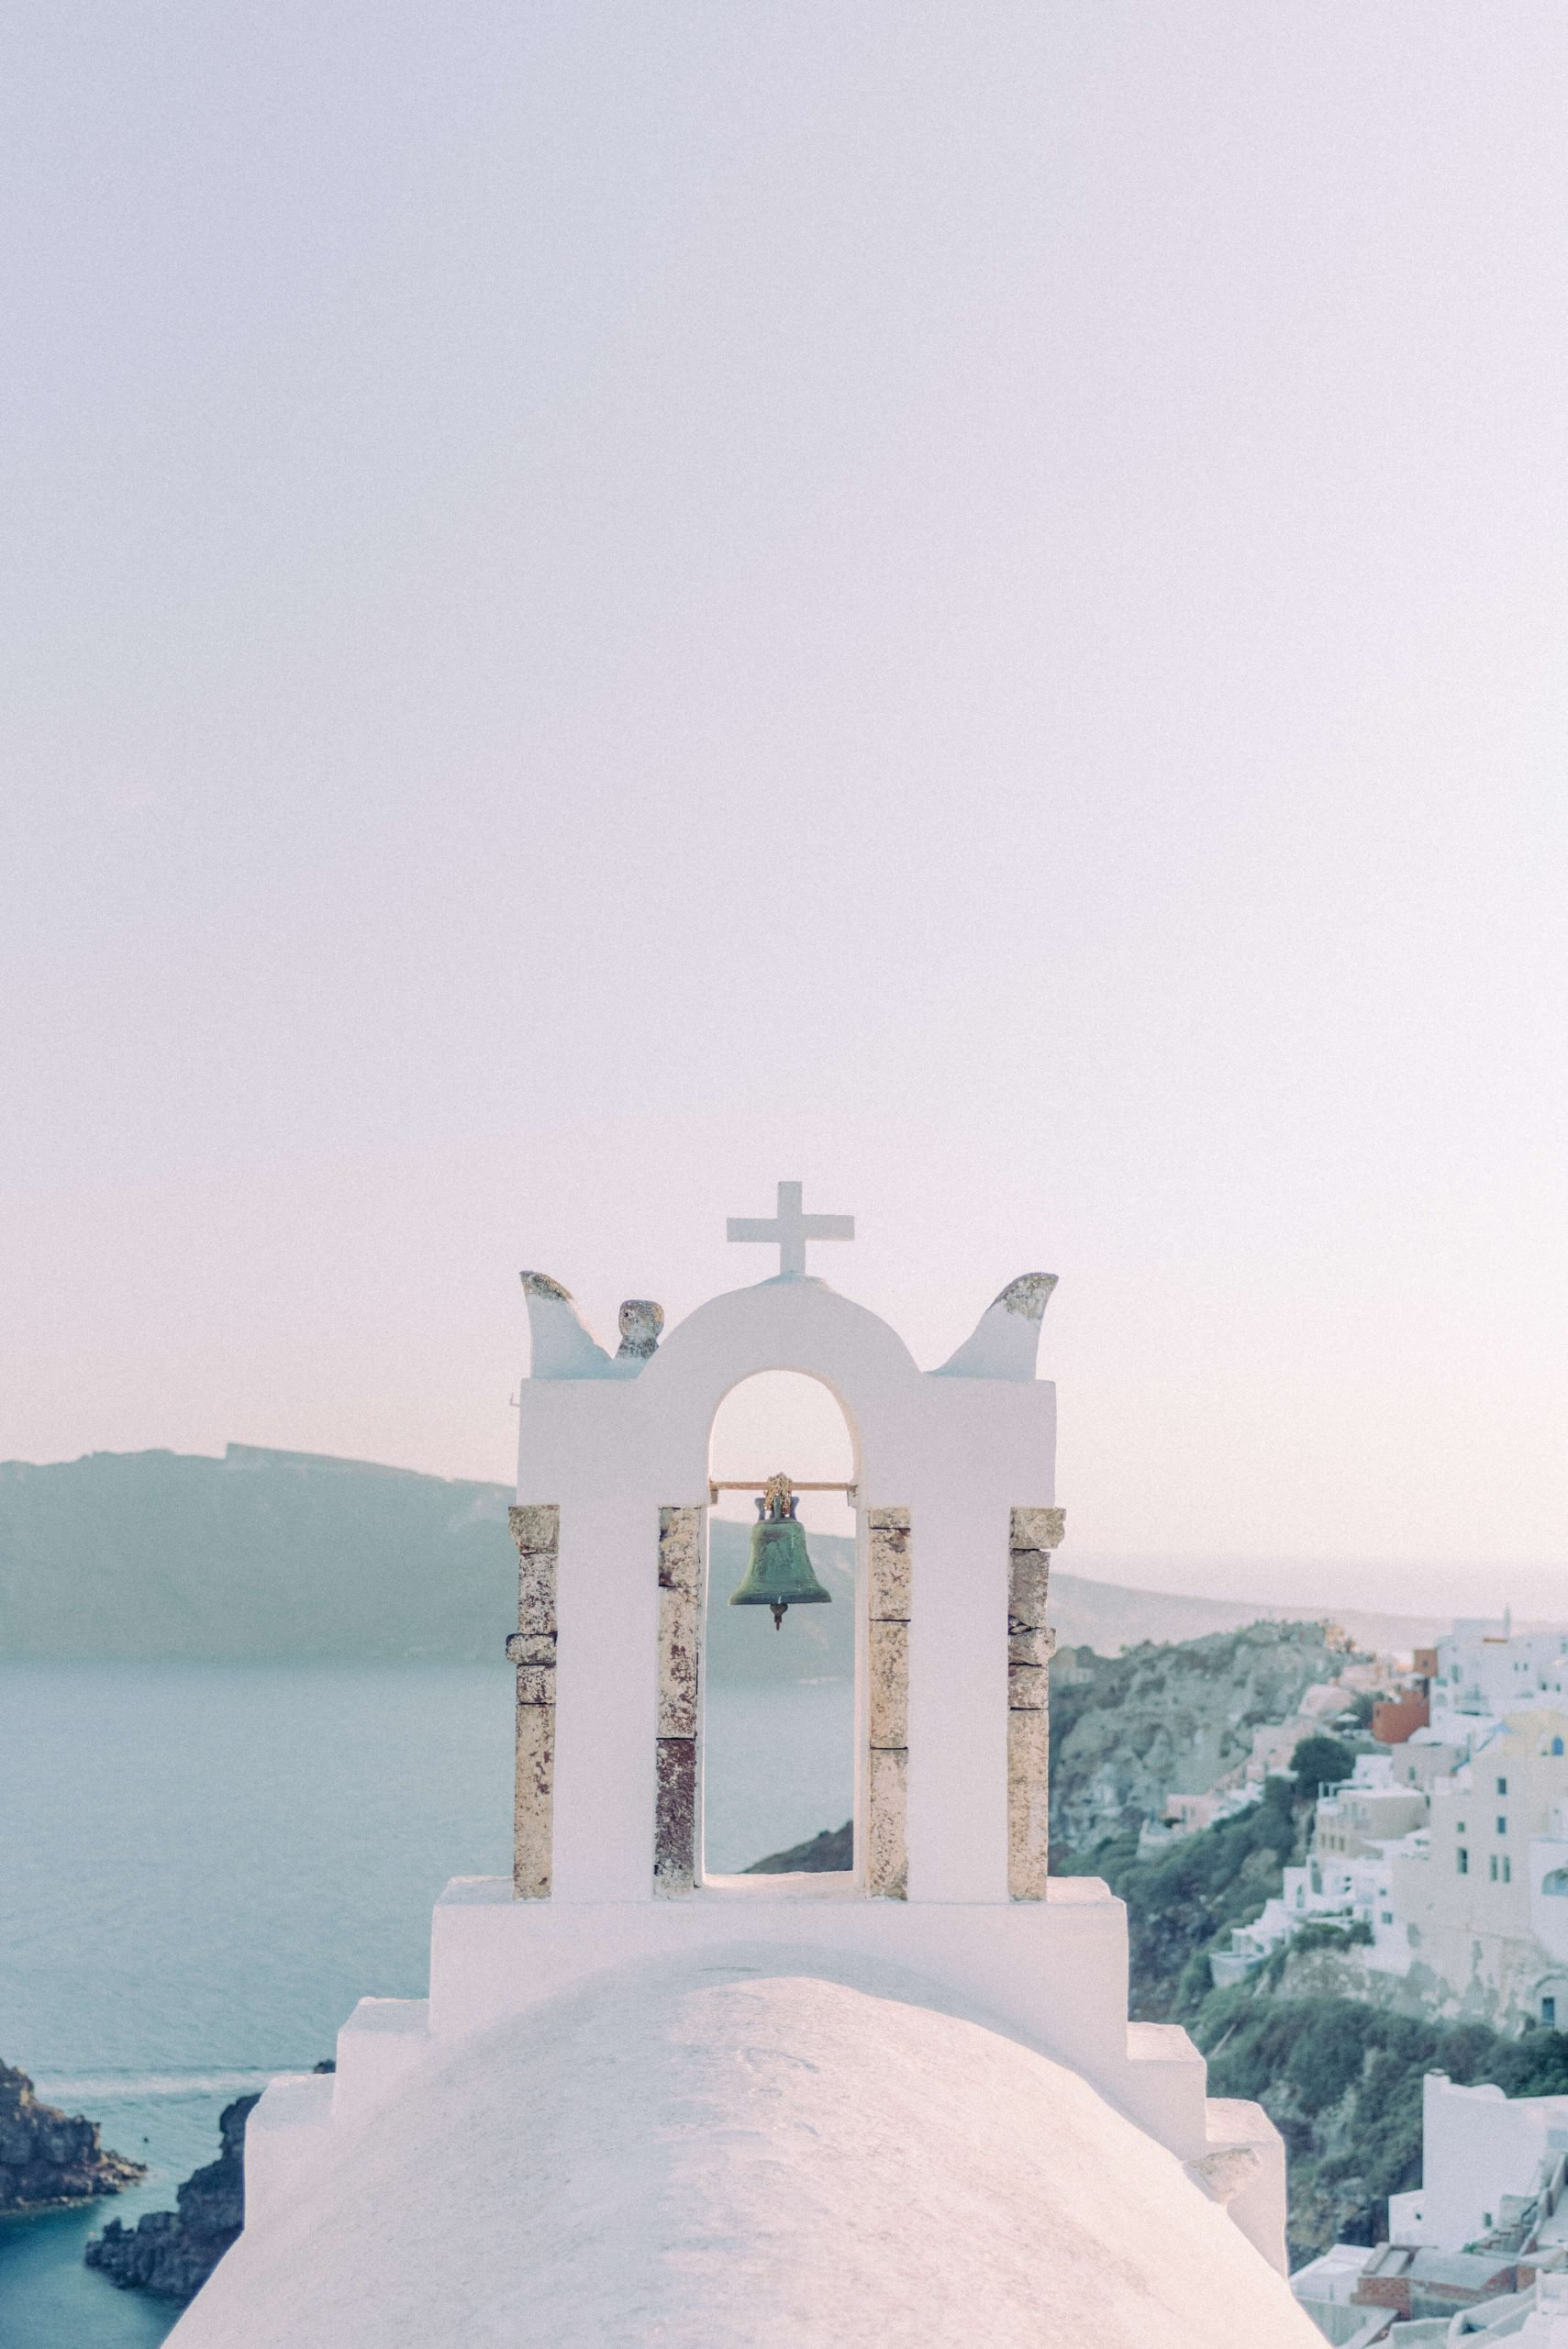 Oia Santorini church bell tower and cross Photography by Cristina Ilao www.cristinailao.com